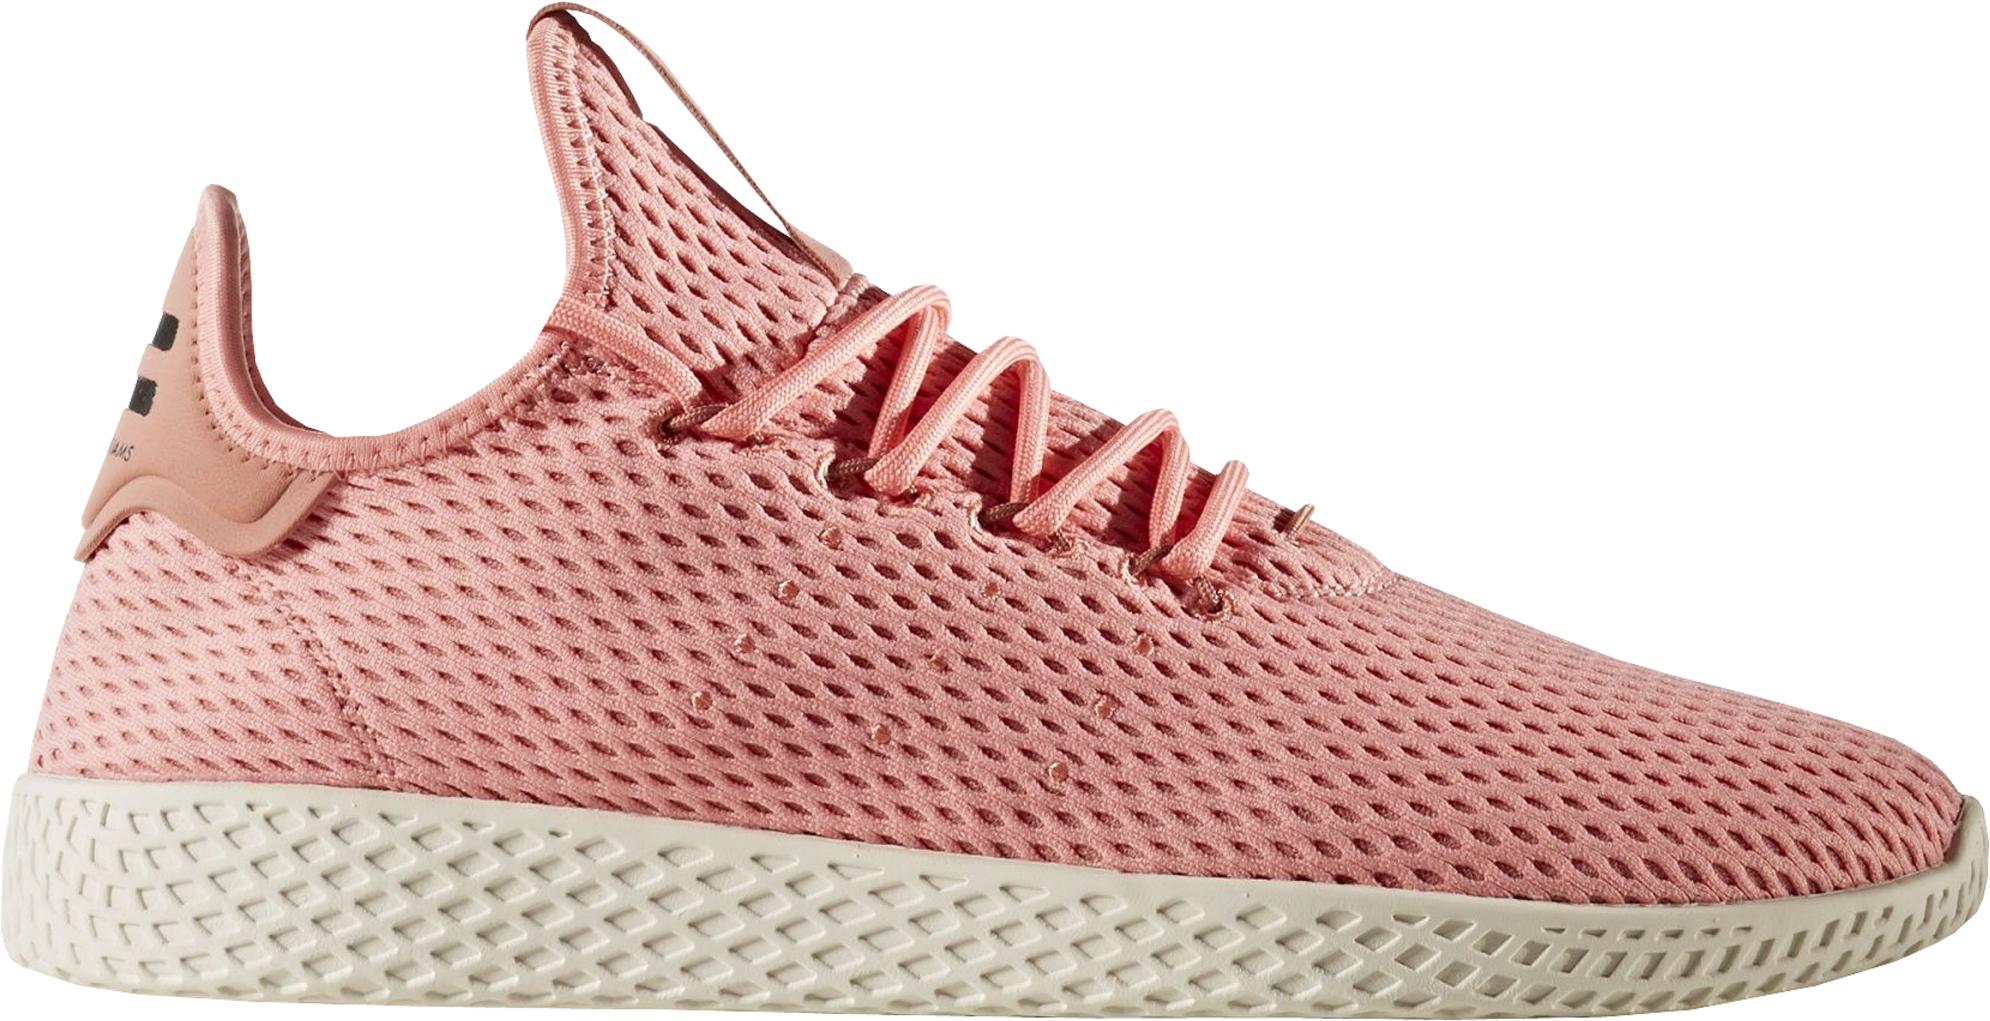 adidas Tennis HU Pharrell Tactile Rose